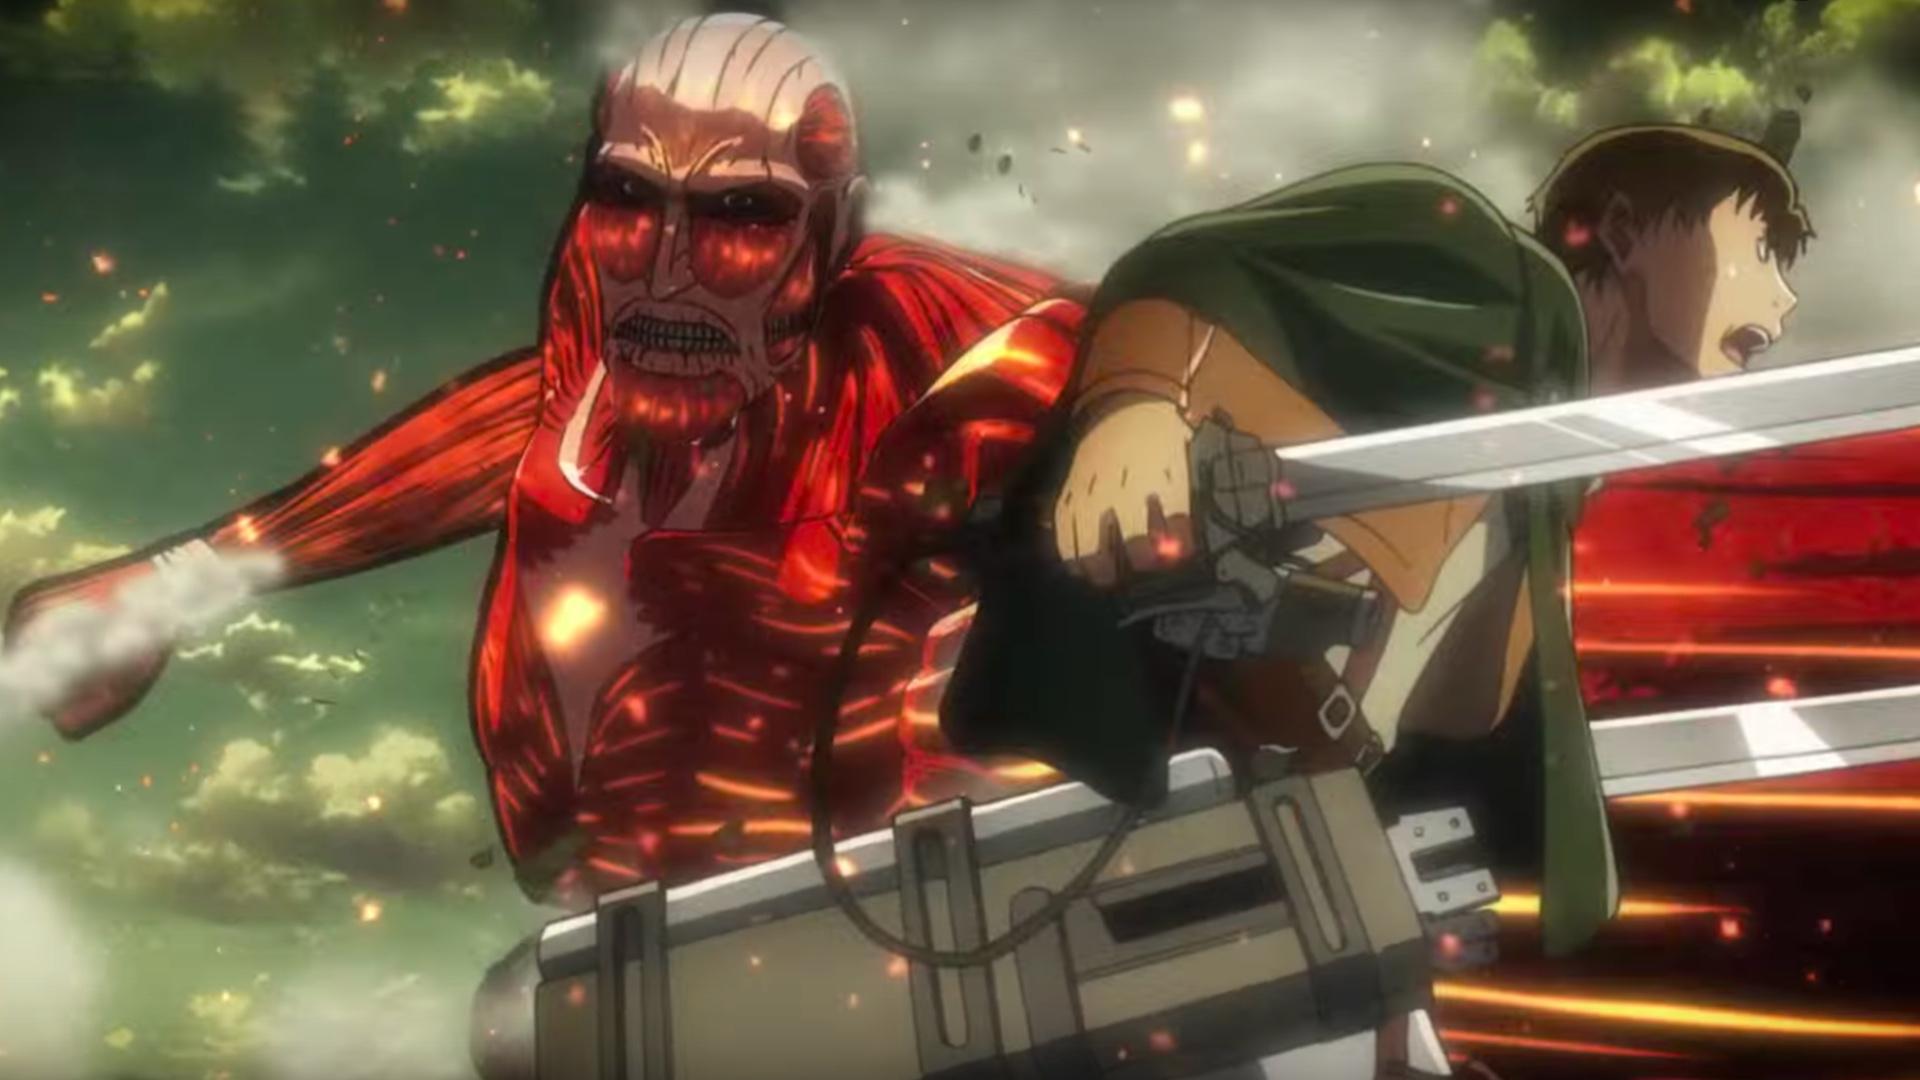 Attack on titan season 2 date